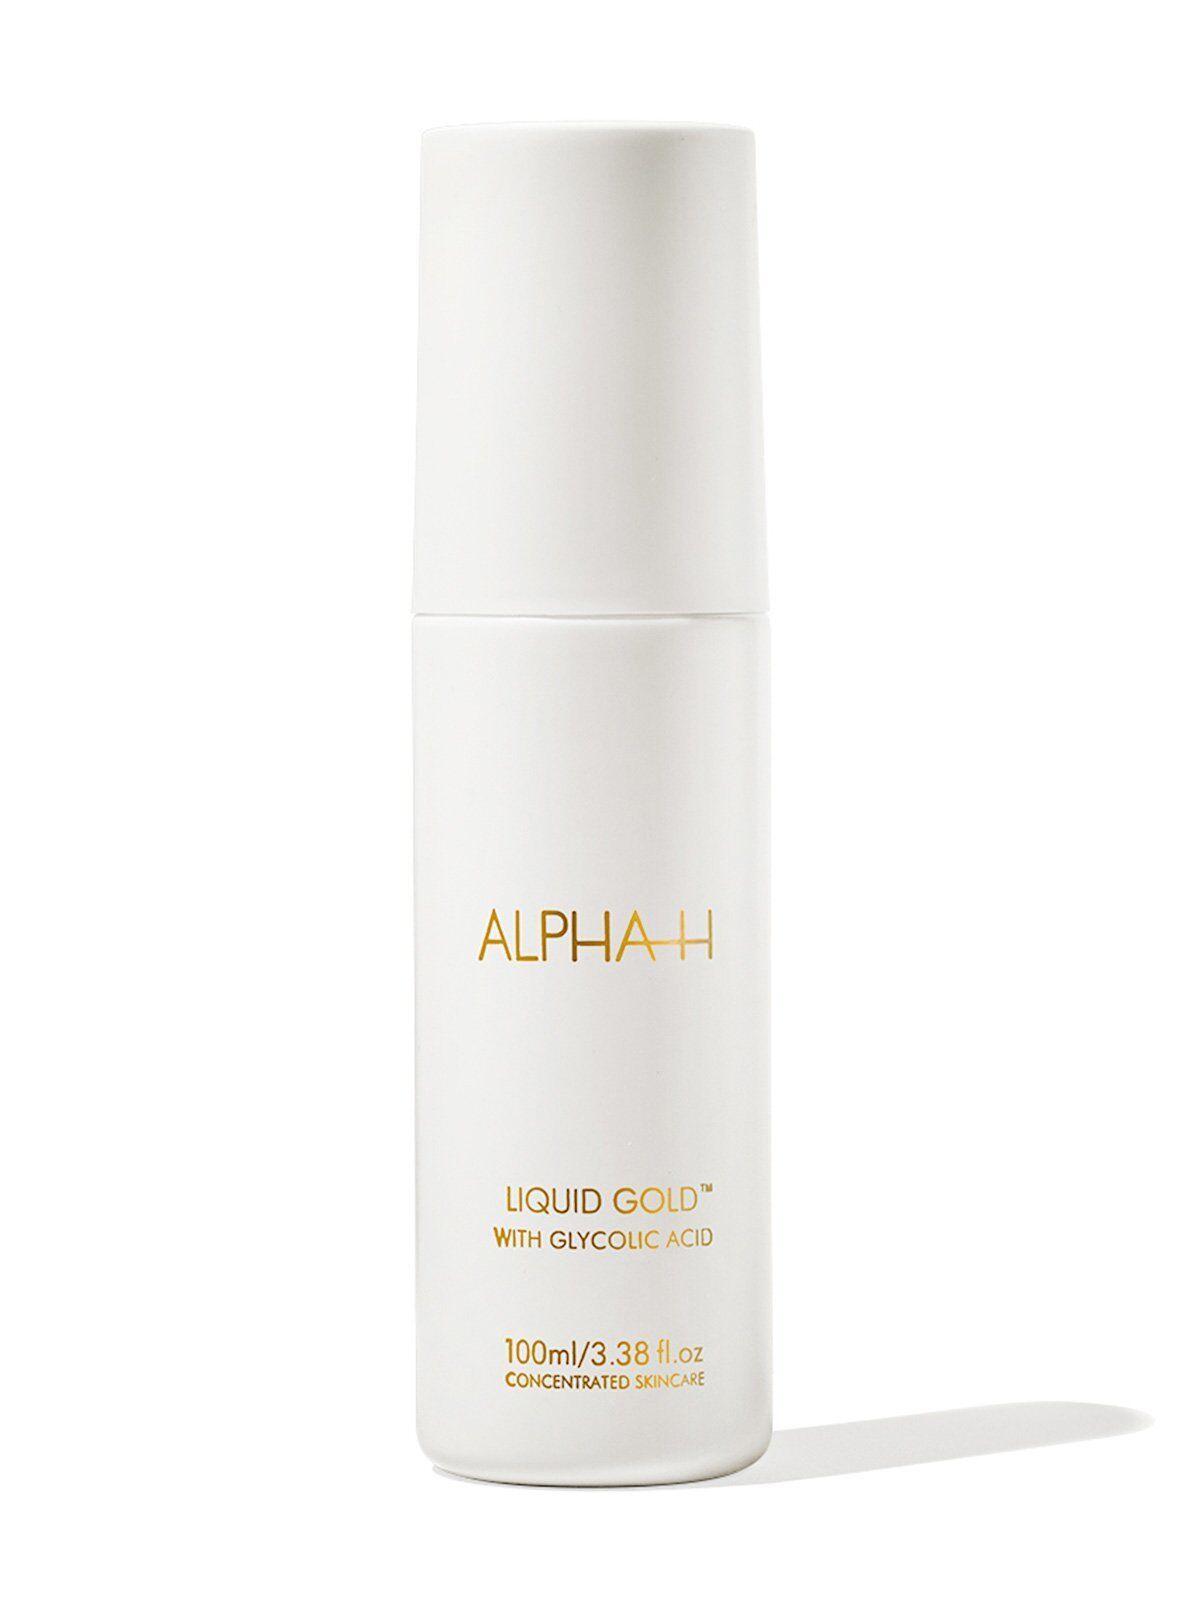 Alpha H - Liquid Gold with 5% Glycolic Acid